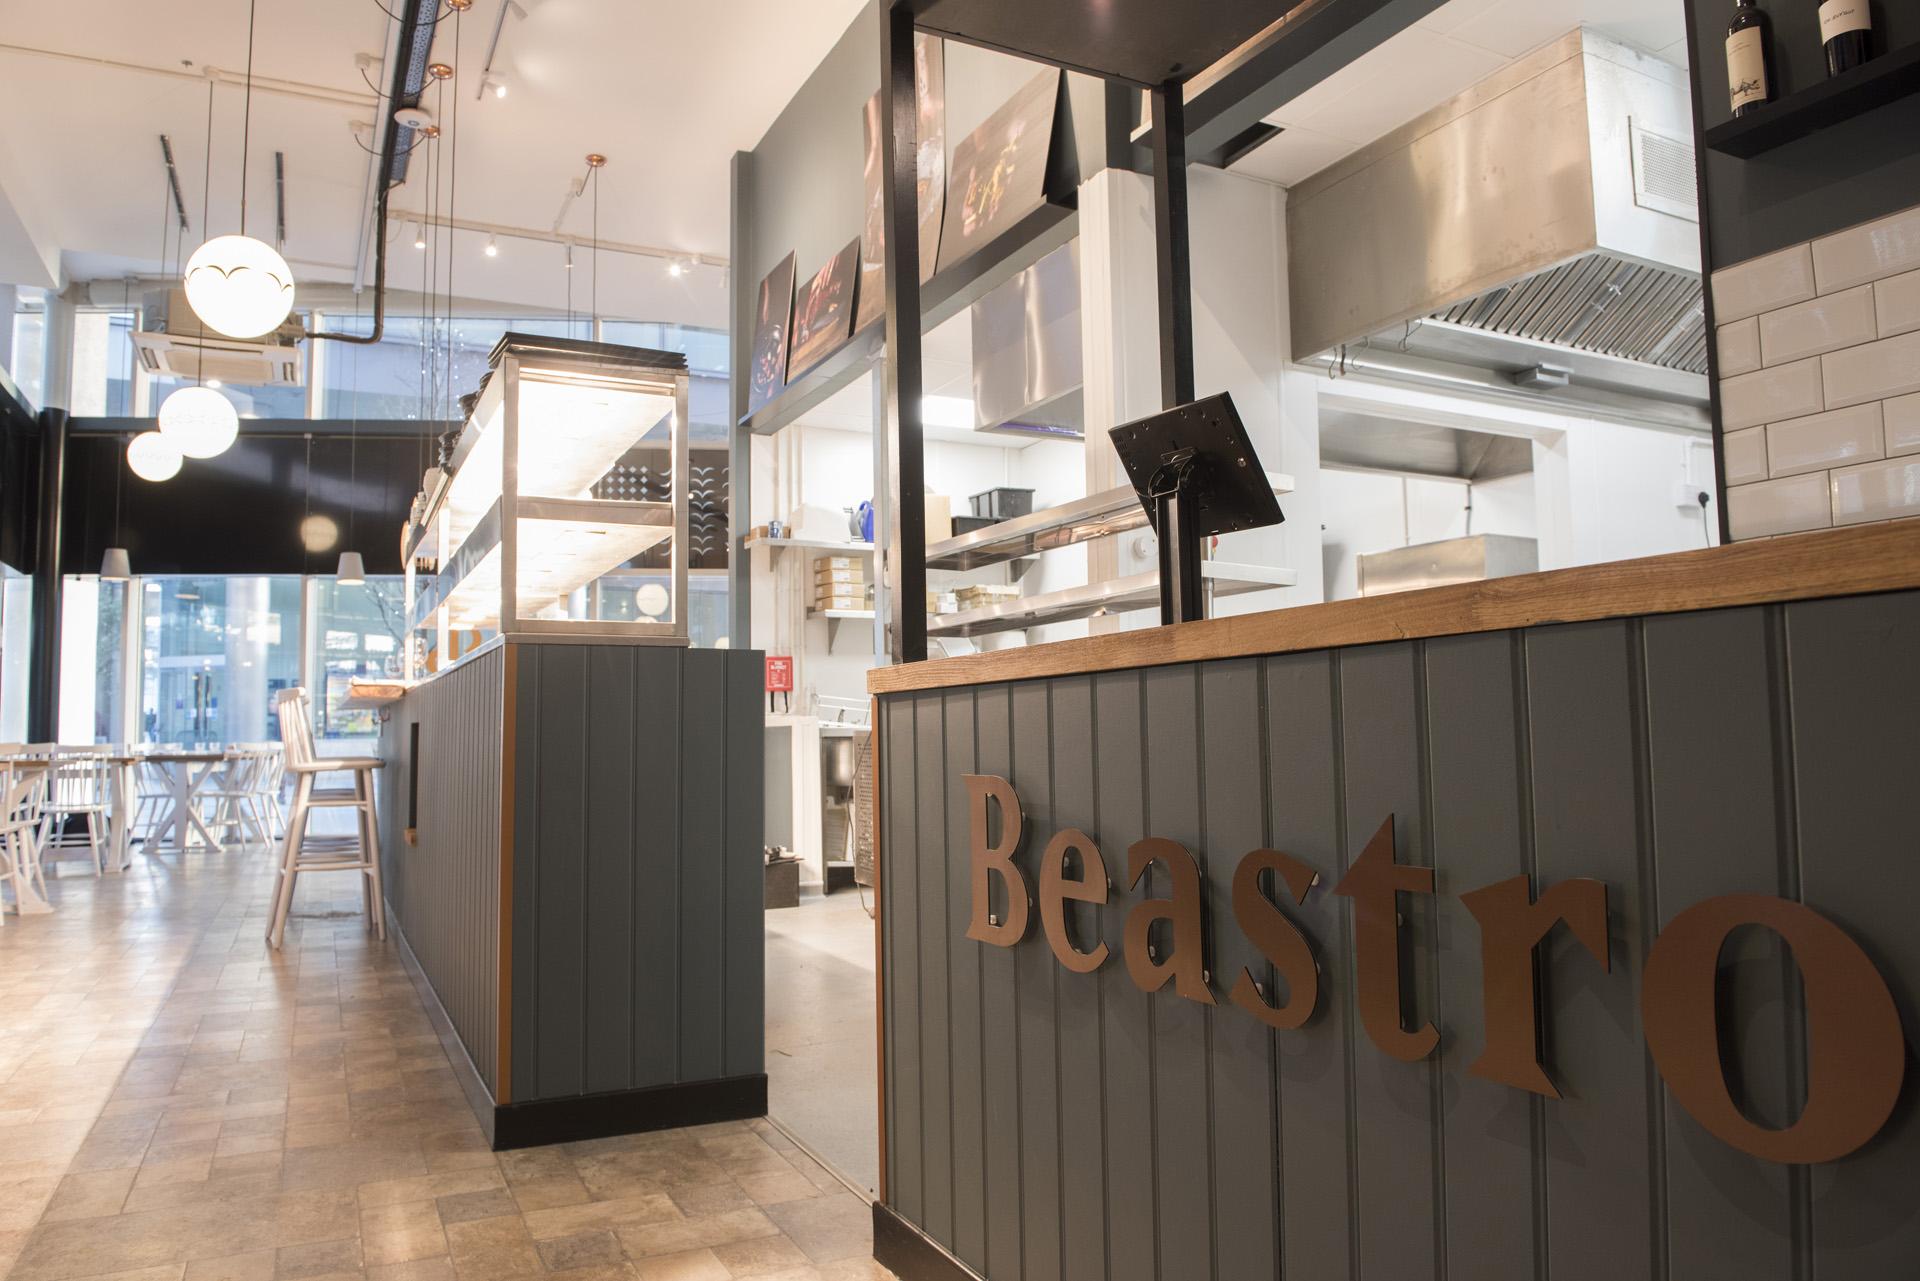 New restaurant Beastro opens in Spinningfields